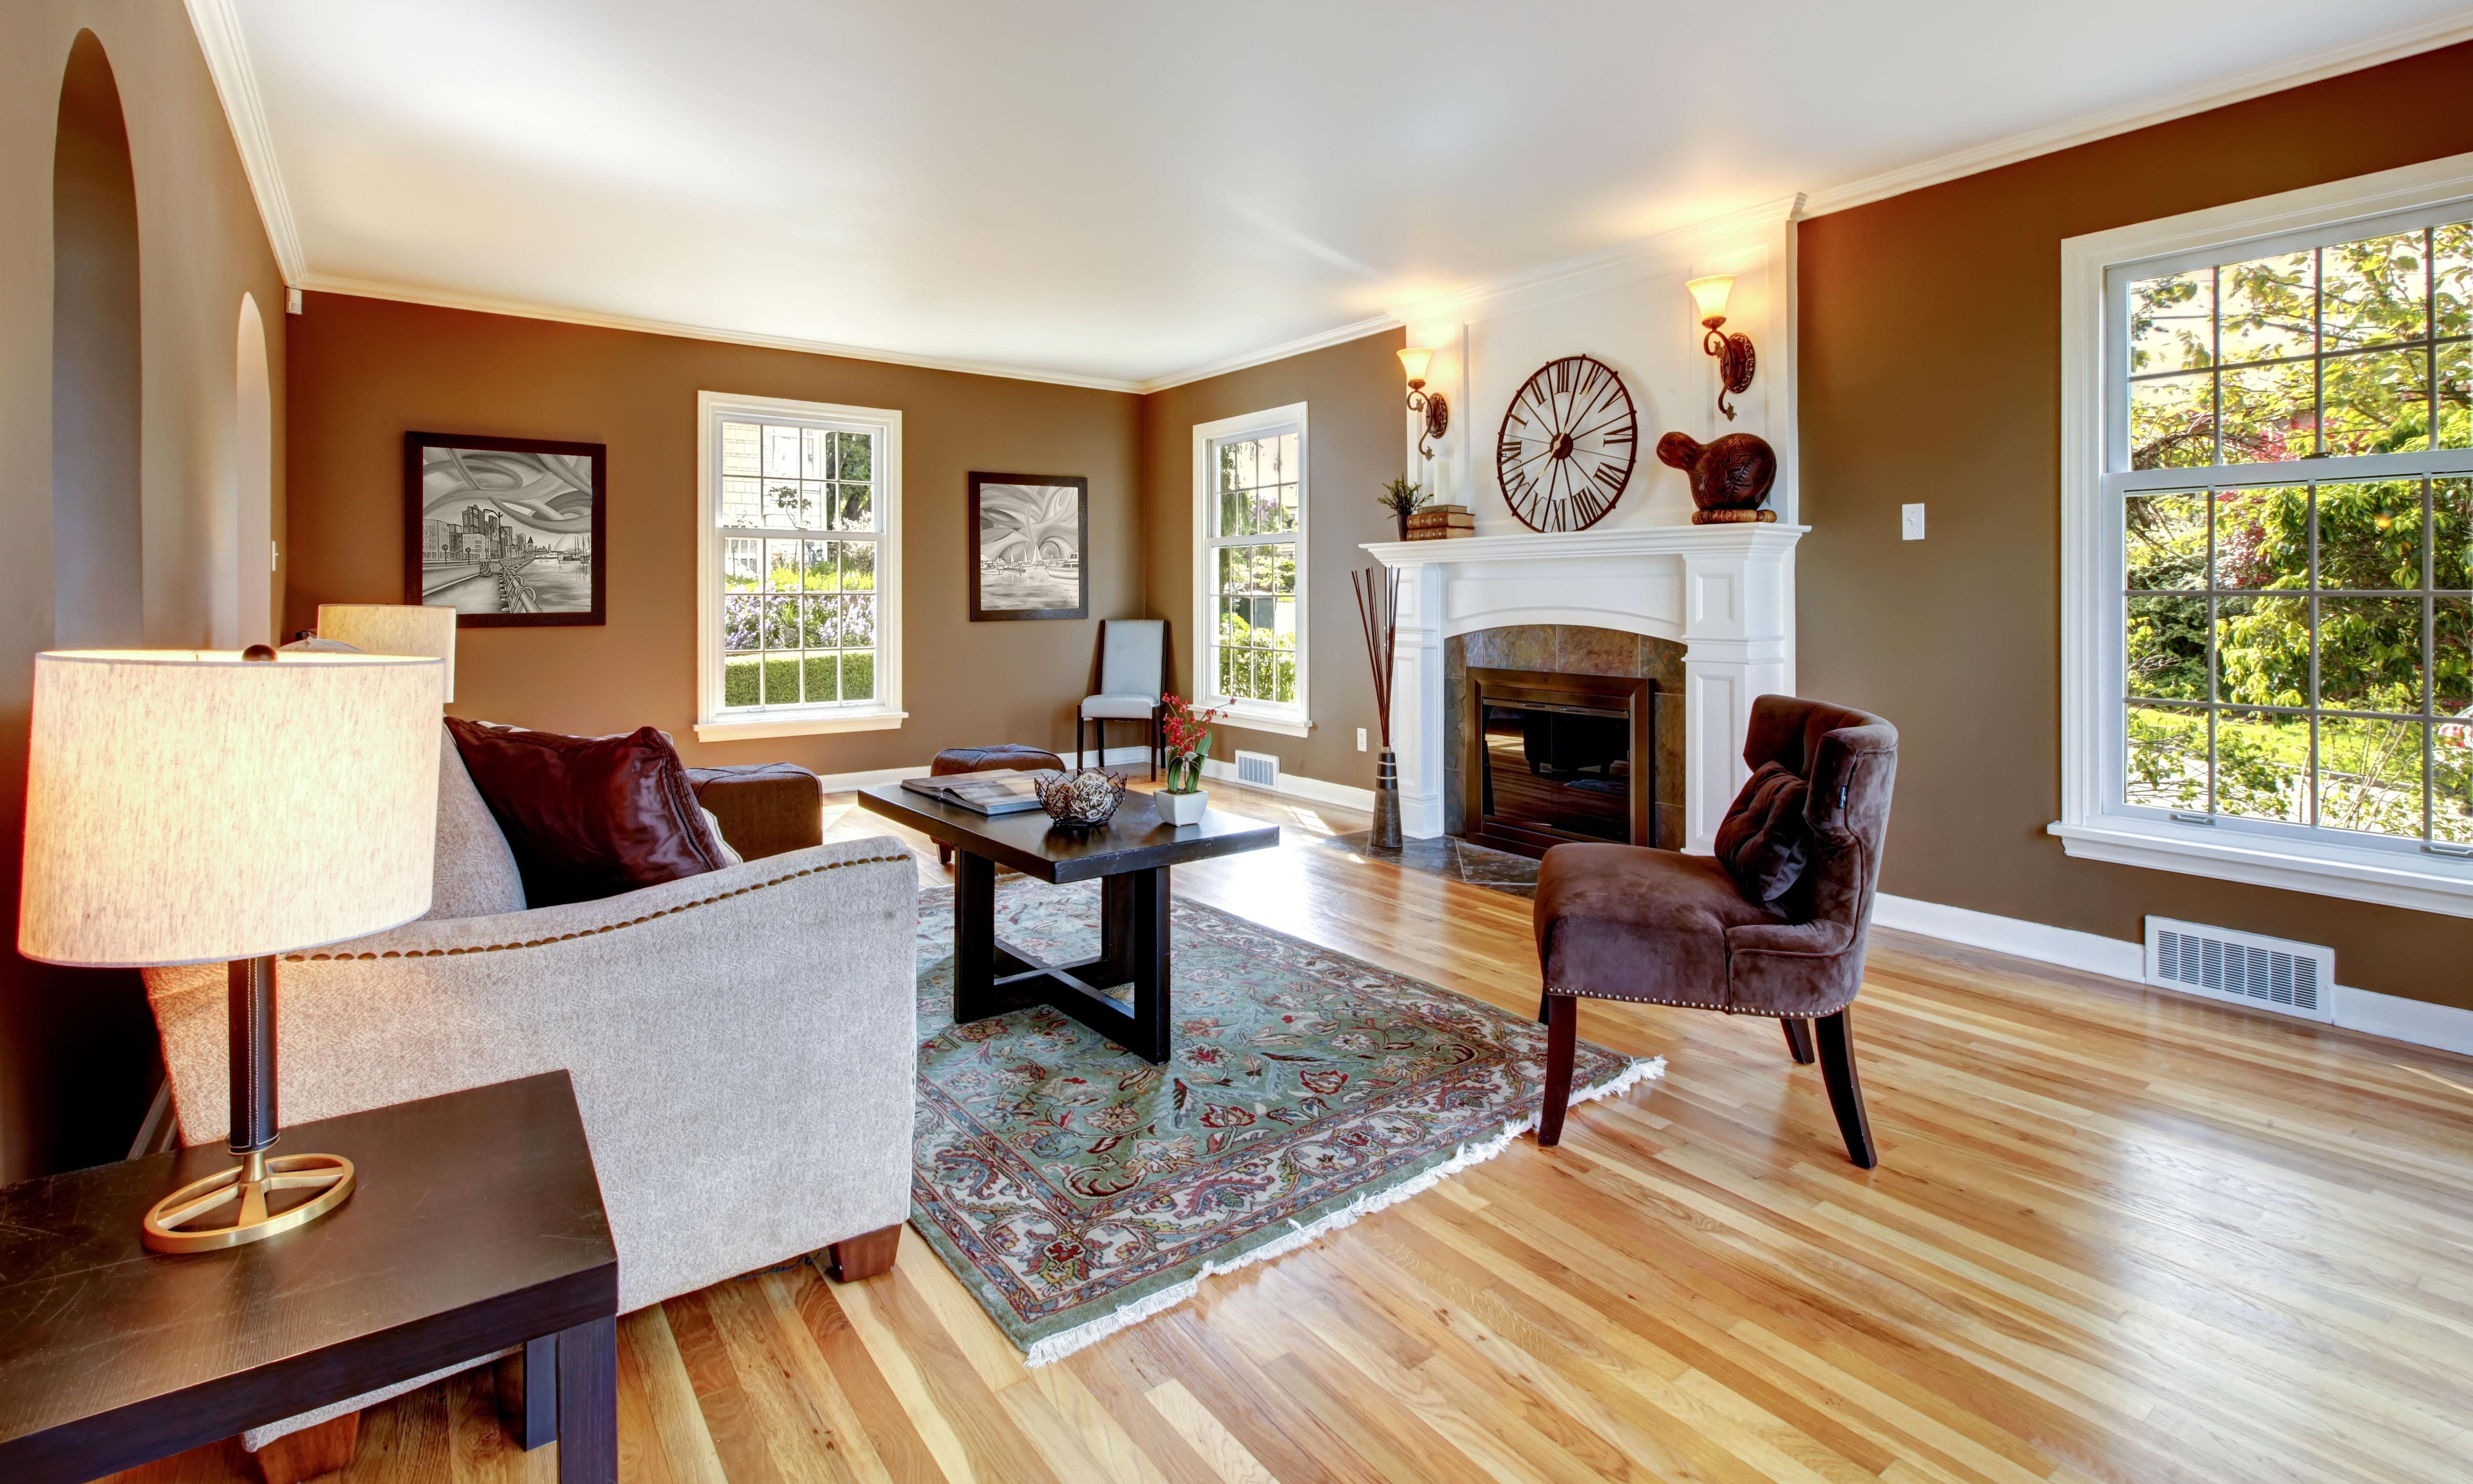 Living Room Remodel Ideas: Grand Rapids Remodeling